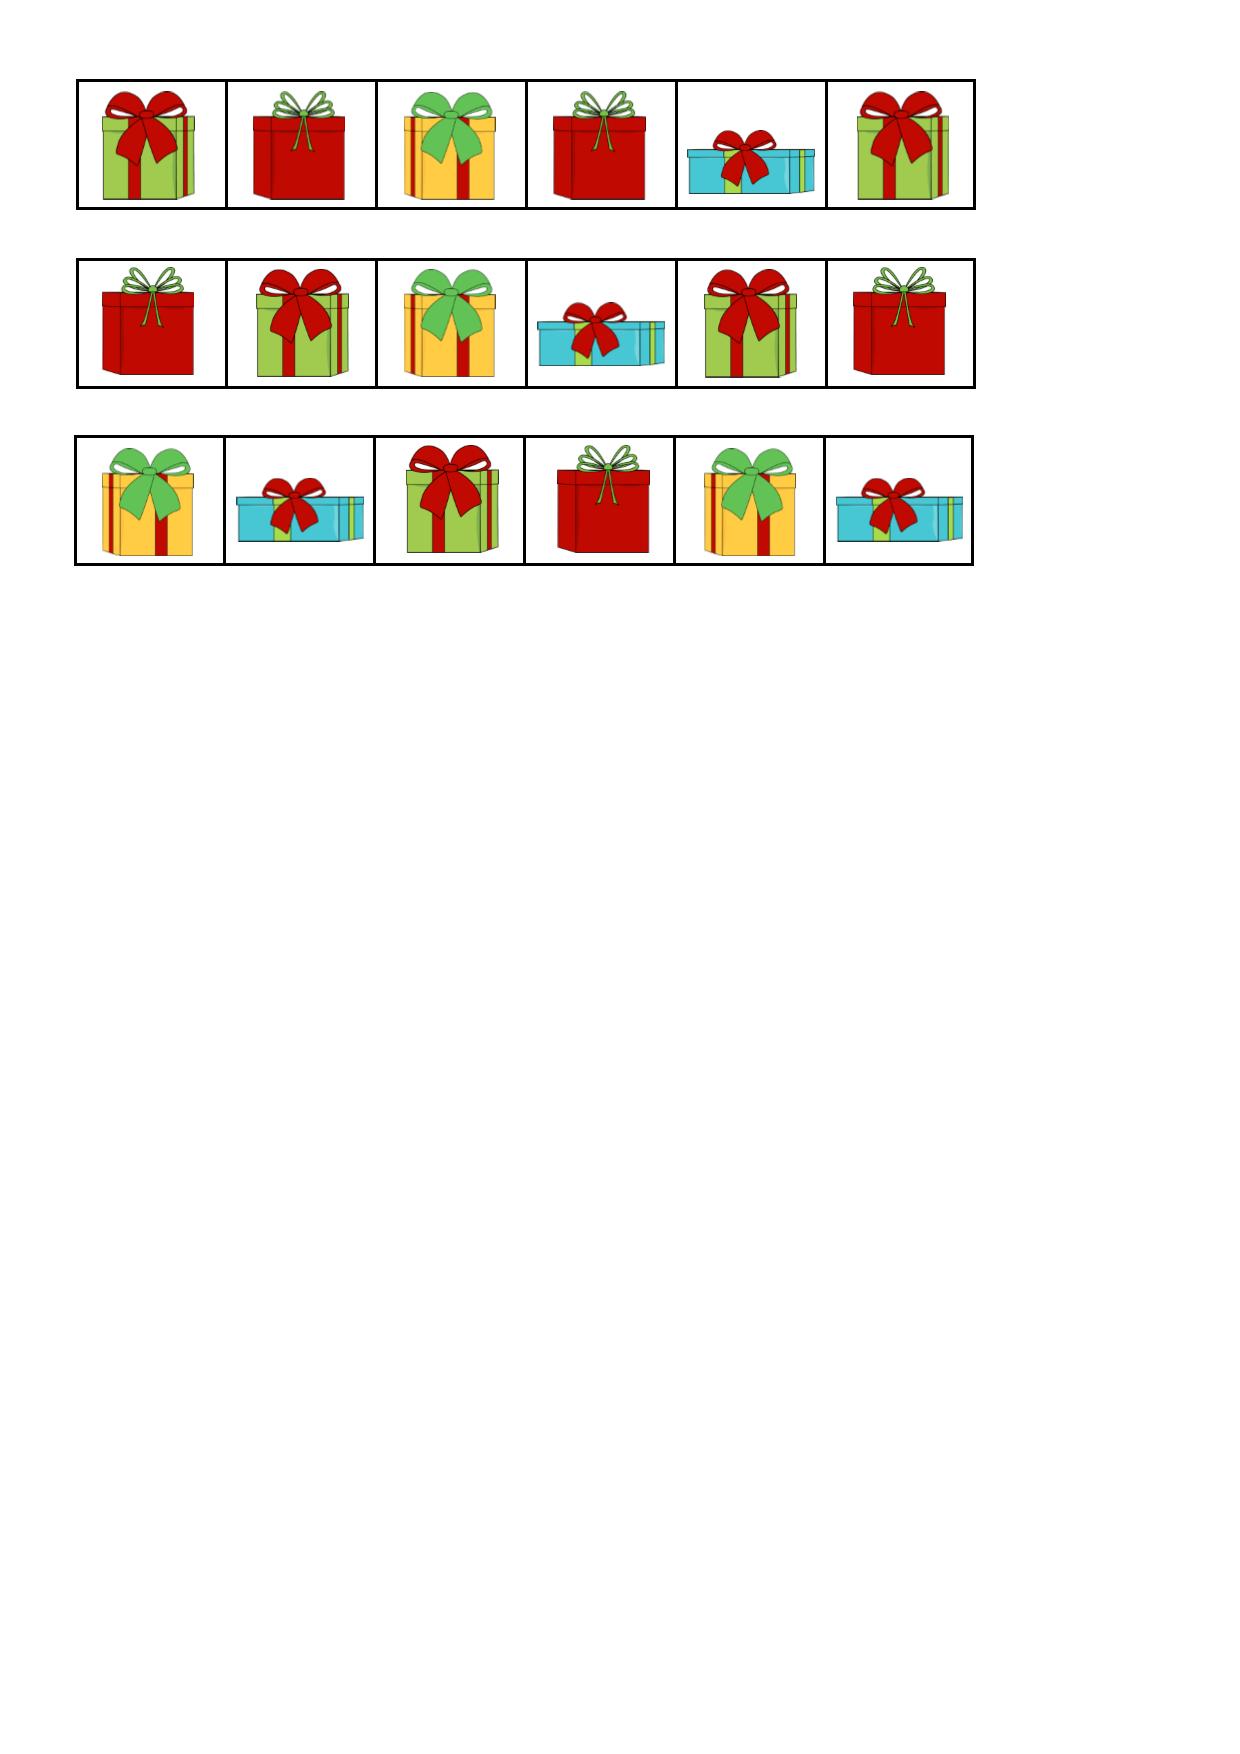 Tiles For The Christmas Present Visual Perception Game